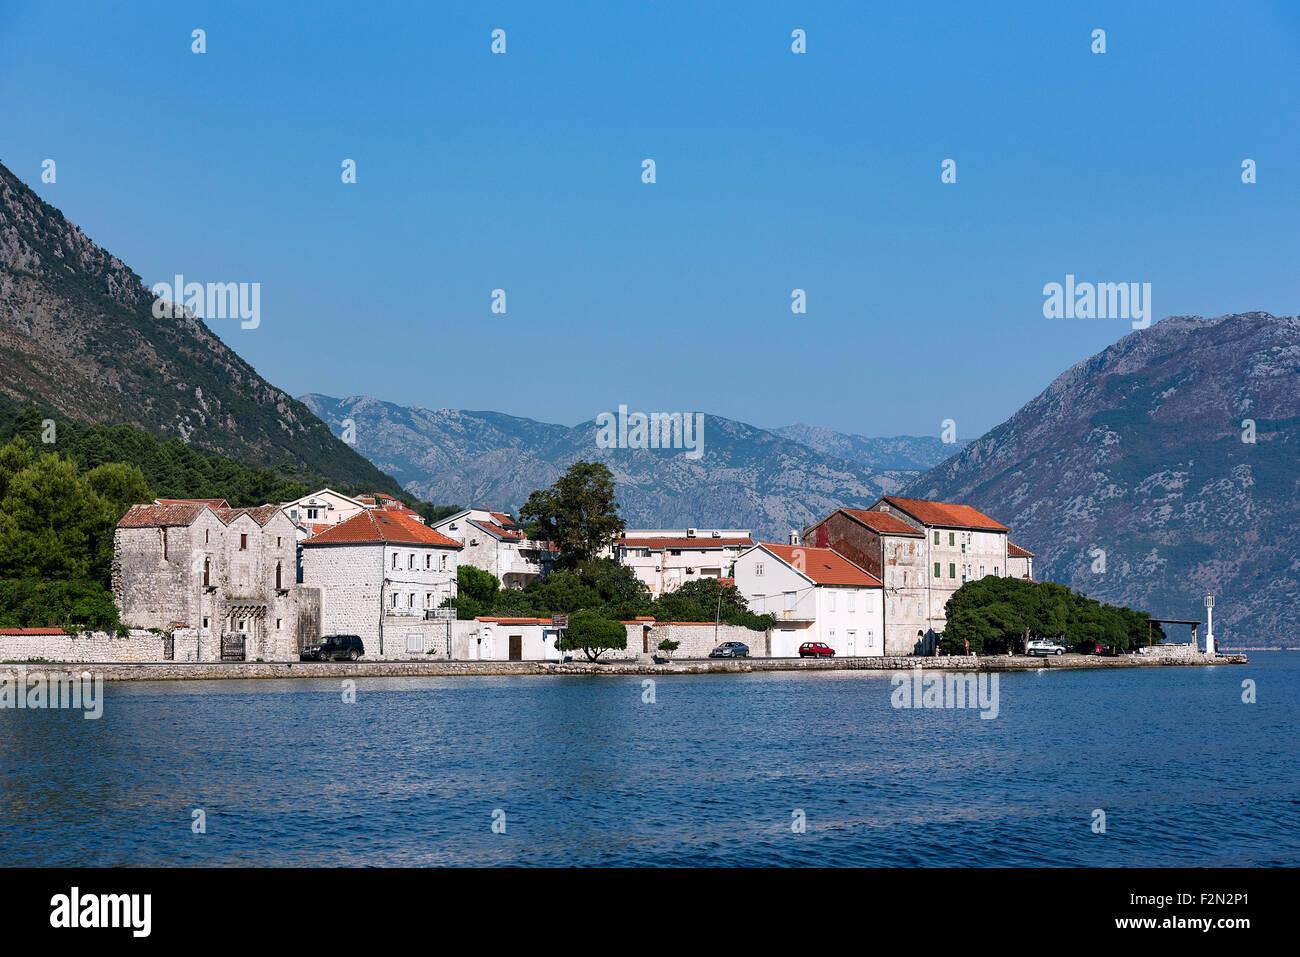 Charming coastal village along the Bay of Kotor, Montenegro Stock Photo